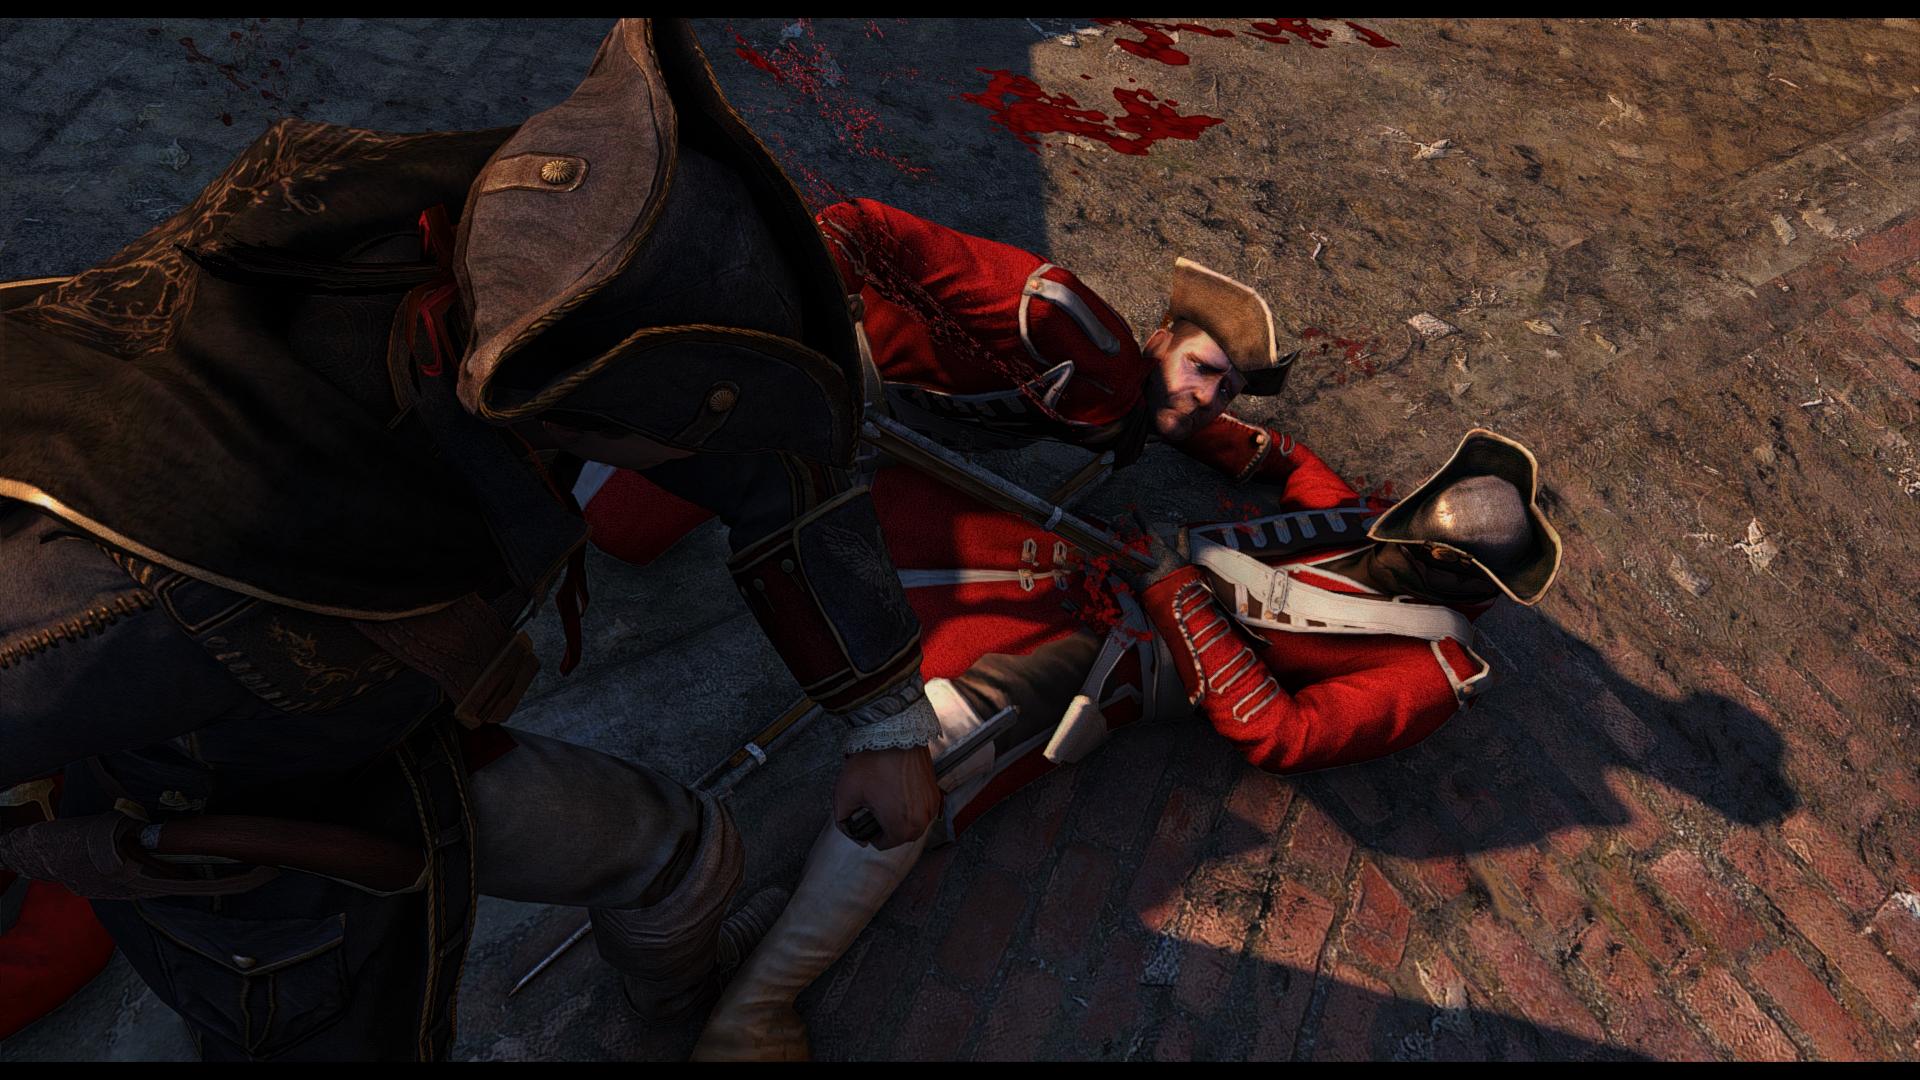 [CONTEST] Assassin's Creed Screenshots AC3SP_2017-03-06_20-19-31